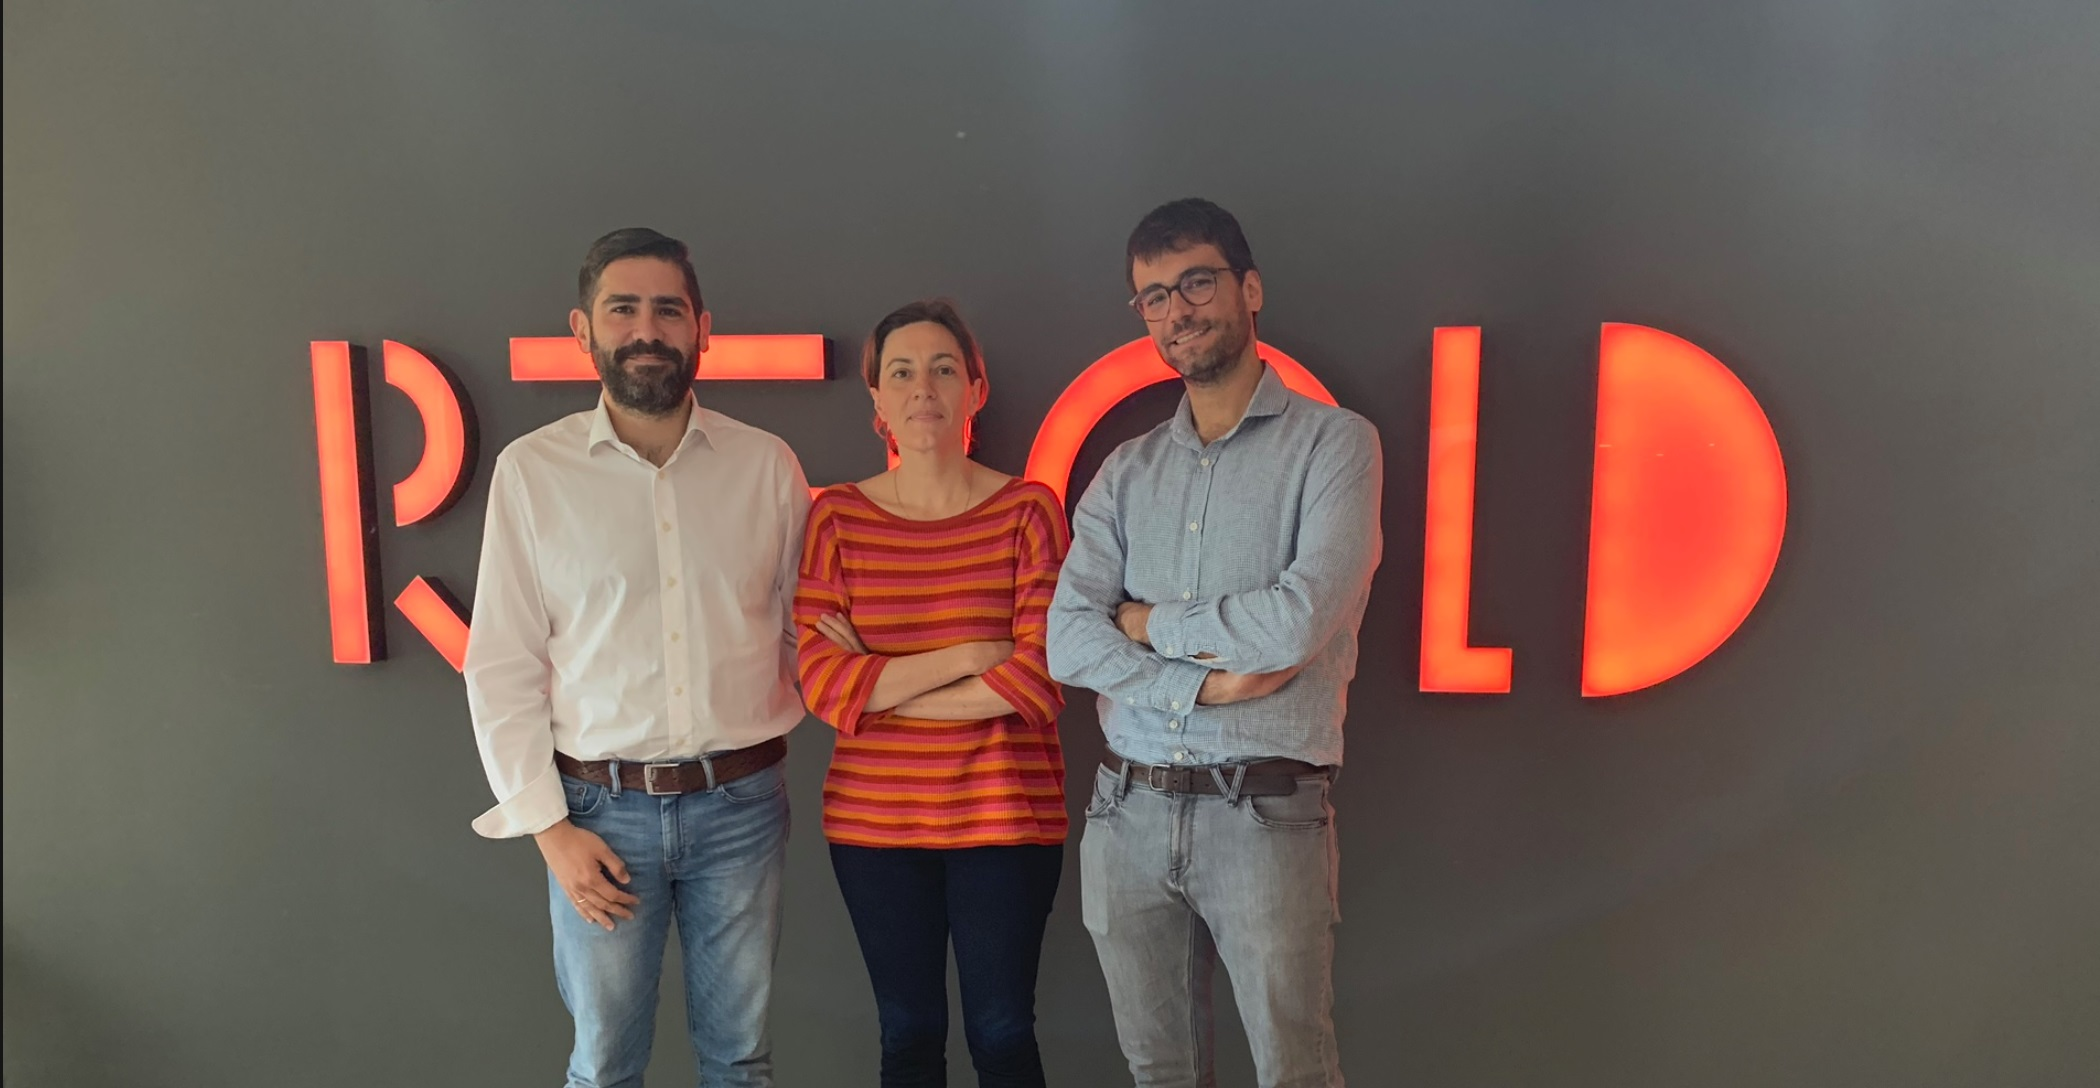 https://www.programapublicidad.com/wp-content/uploads/2019/05/Miguel-Moraleja-director-de-Data-Science-Rubén-Orta-Chief-Technology-Officer-Gloria-Andreu-directora-Producto.-rebold-programapublicidad-muy-grande.jpg